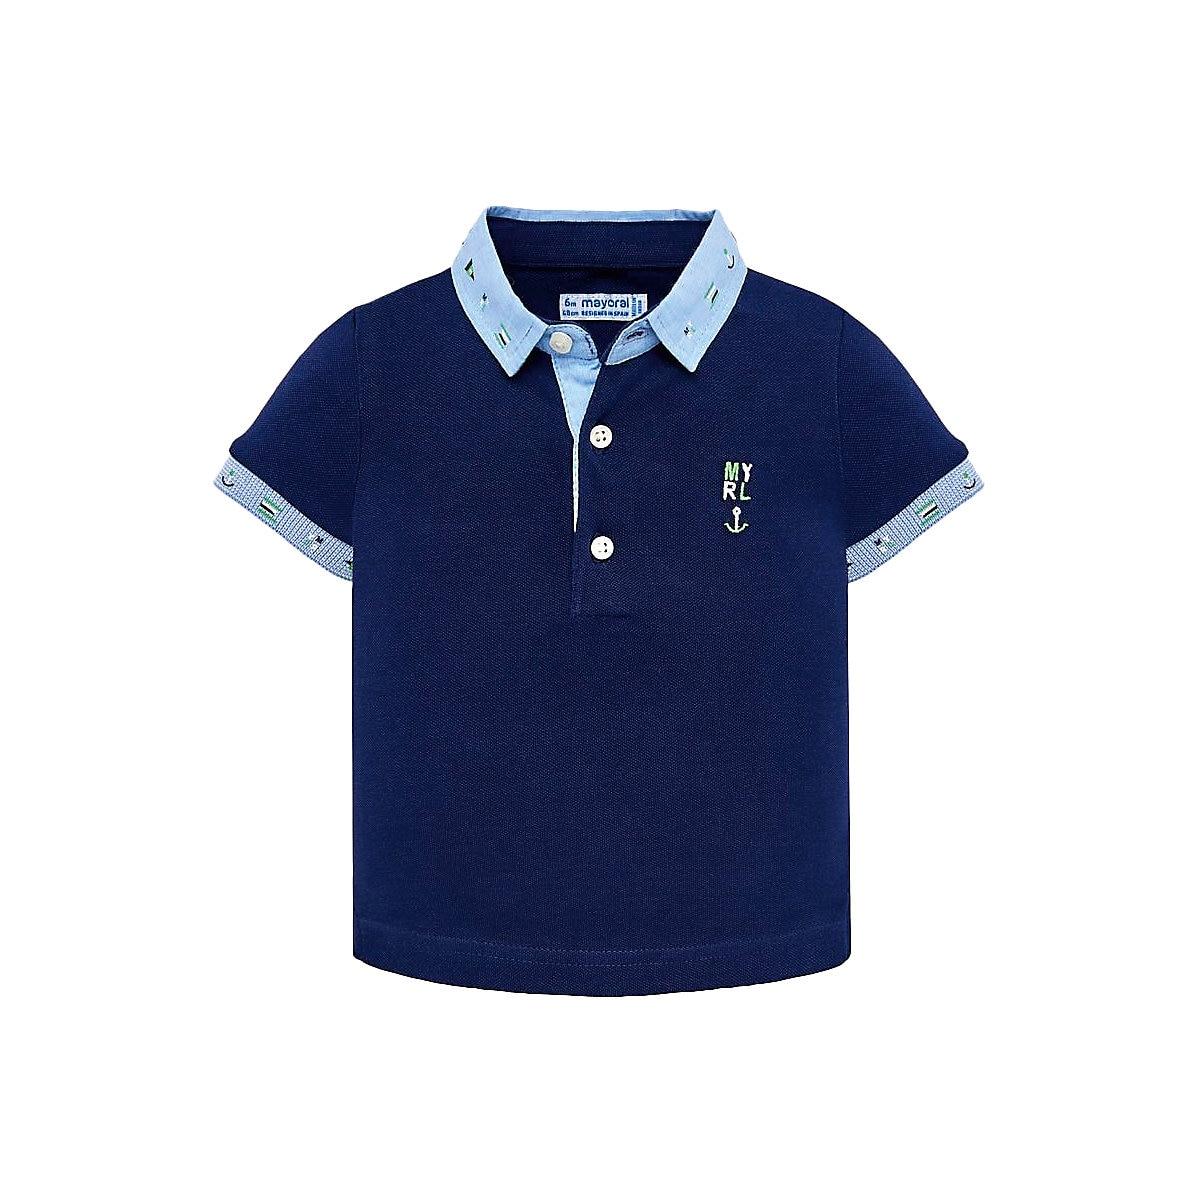 MAYORAL Polo Shirts 10693193 children clothing t-shirt shirt the print for boys